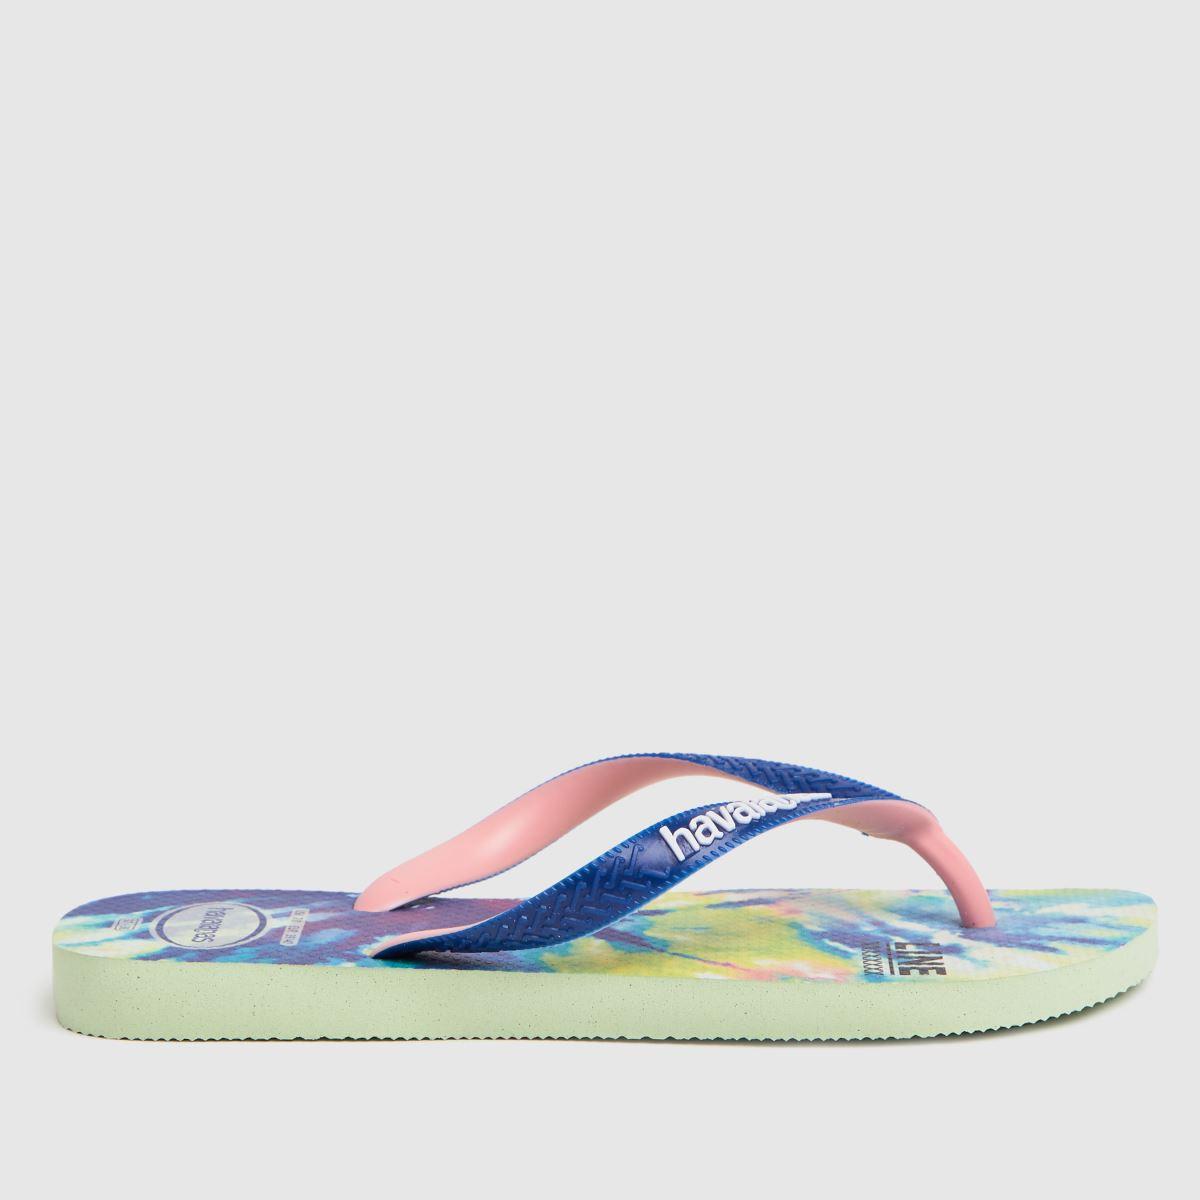 Havaianas Multi Top Fashion Sandals